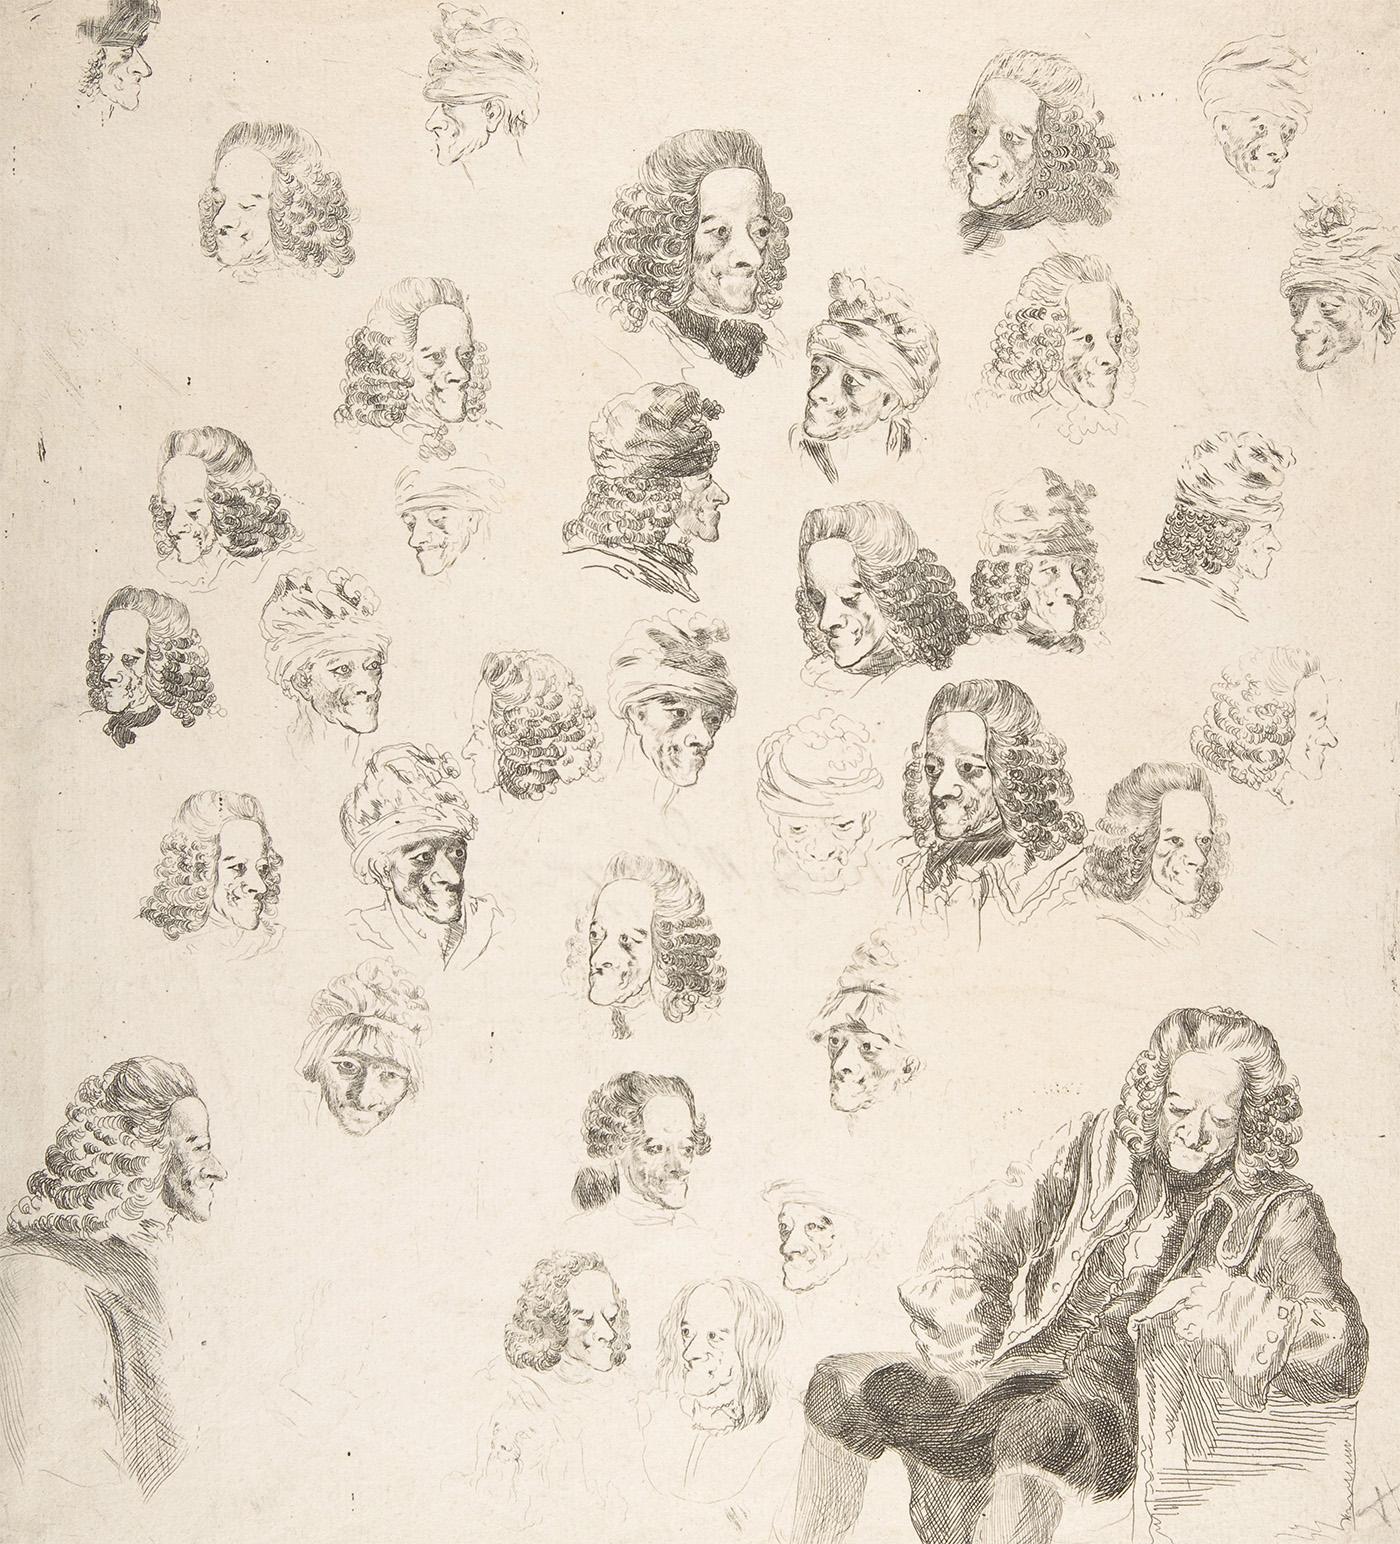 Барон Денон. Зарисовки Вольтера в возрасте 81 года. 1775 г.